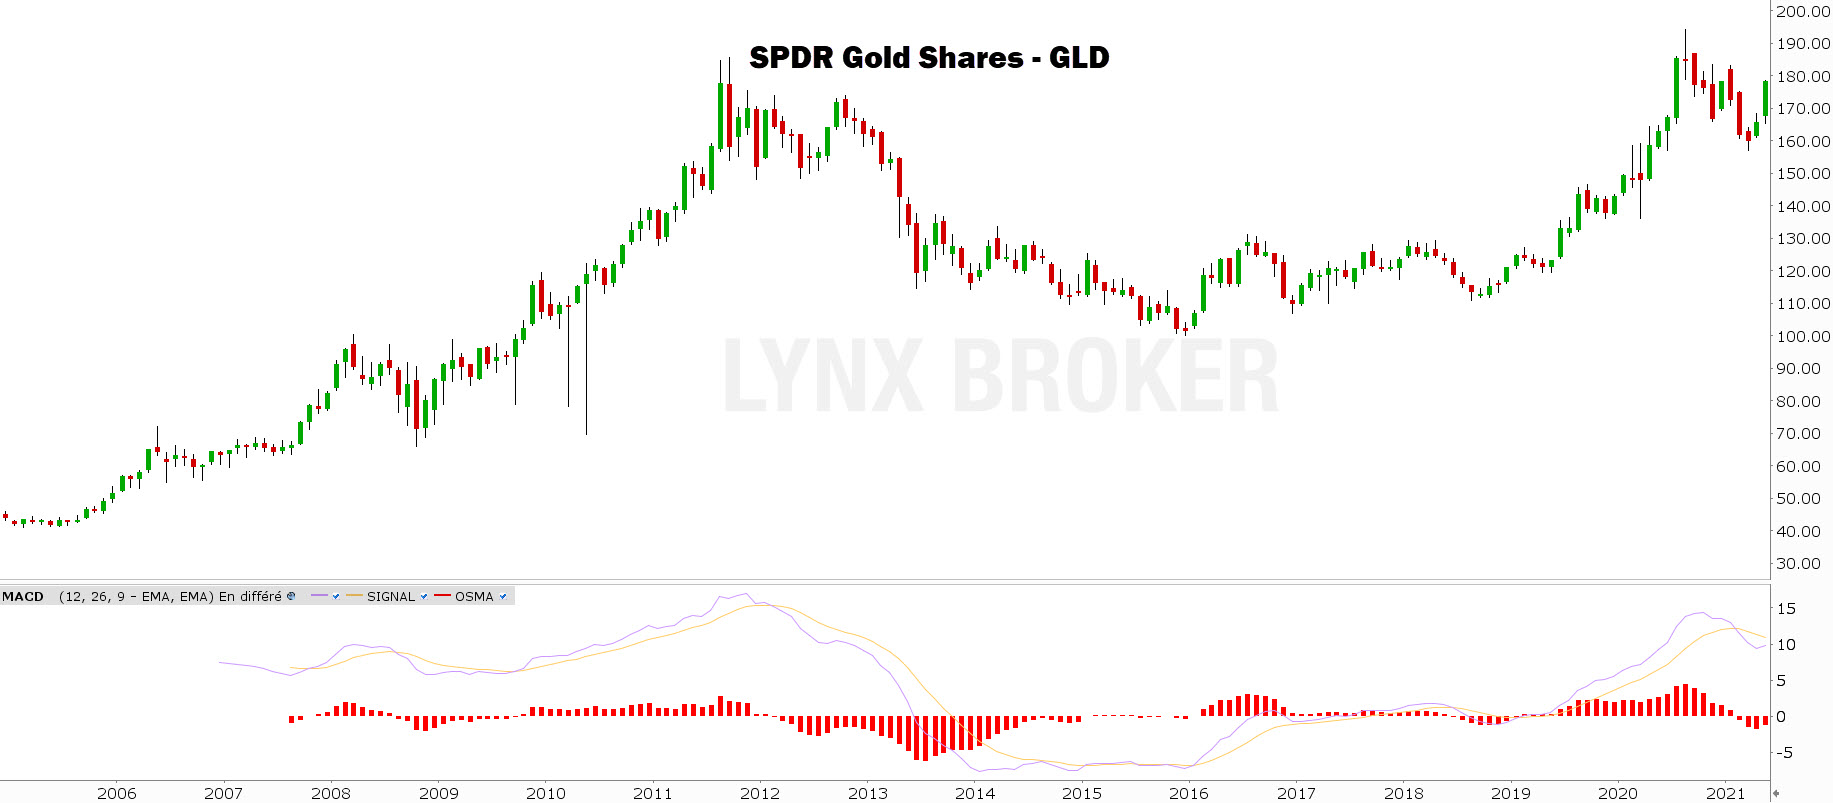 prix de l'or graphique mensuel GLD avec MACD